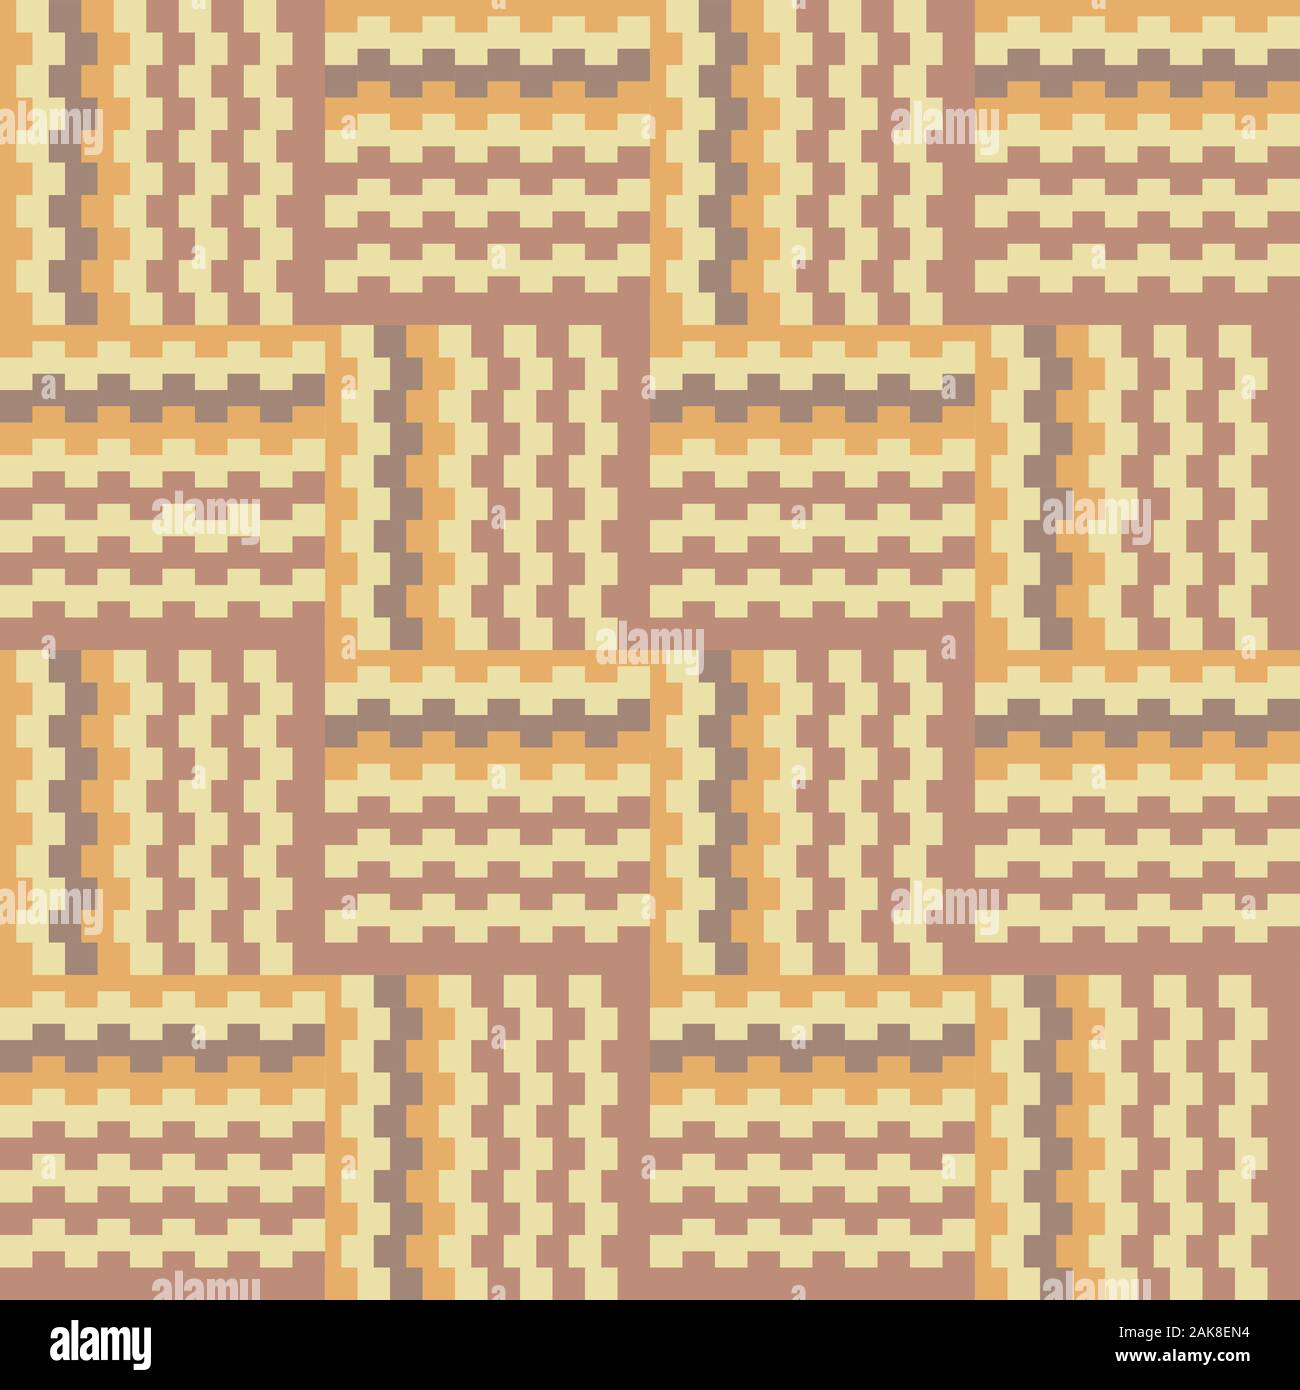 Geometric crisscross pattern in brownish earth tones. Stock Photo